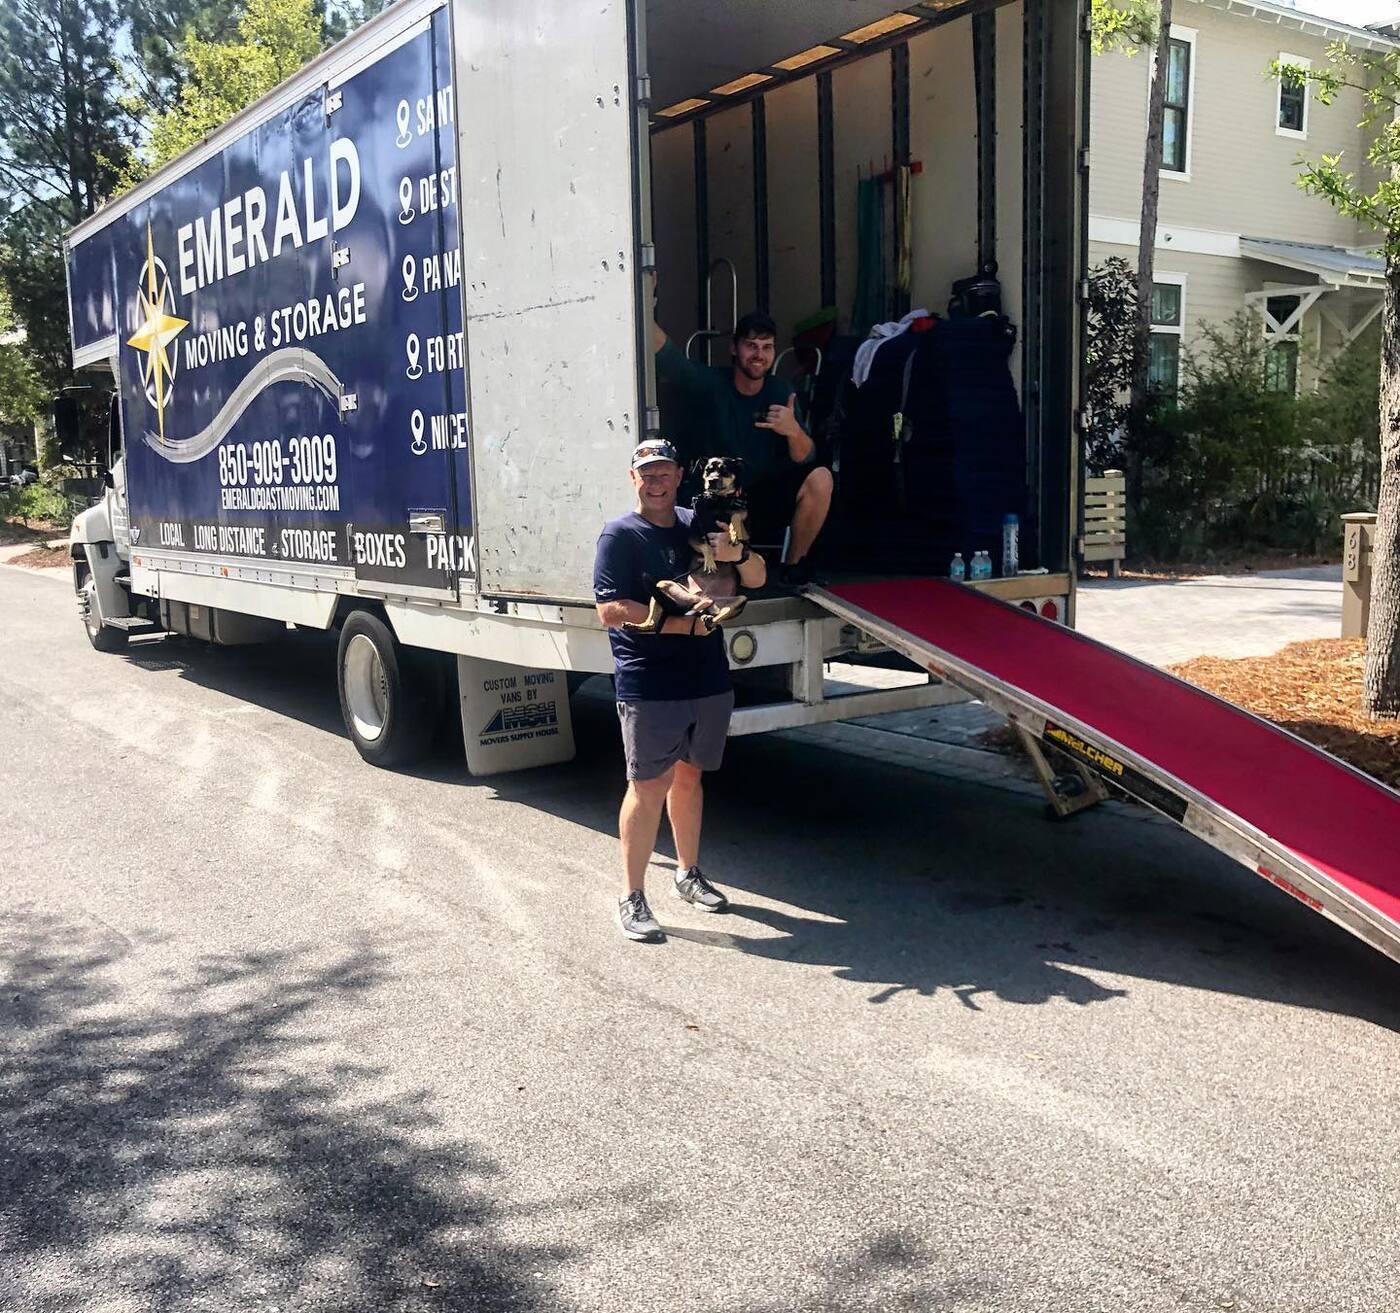 Emerald Coast Moving & Storage